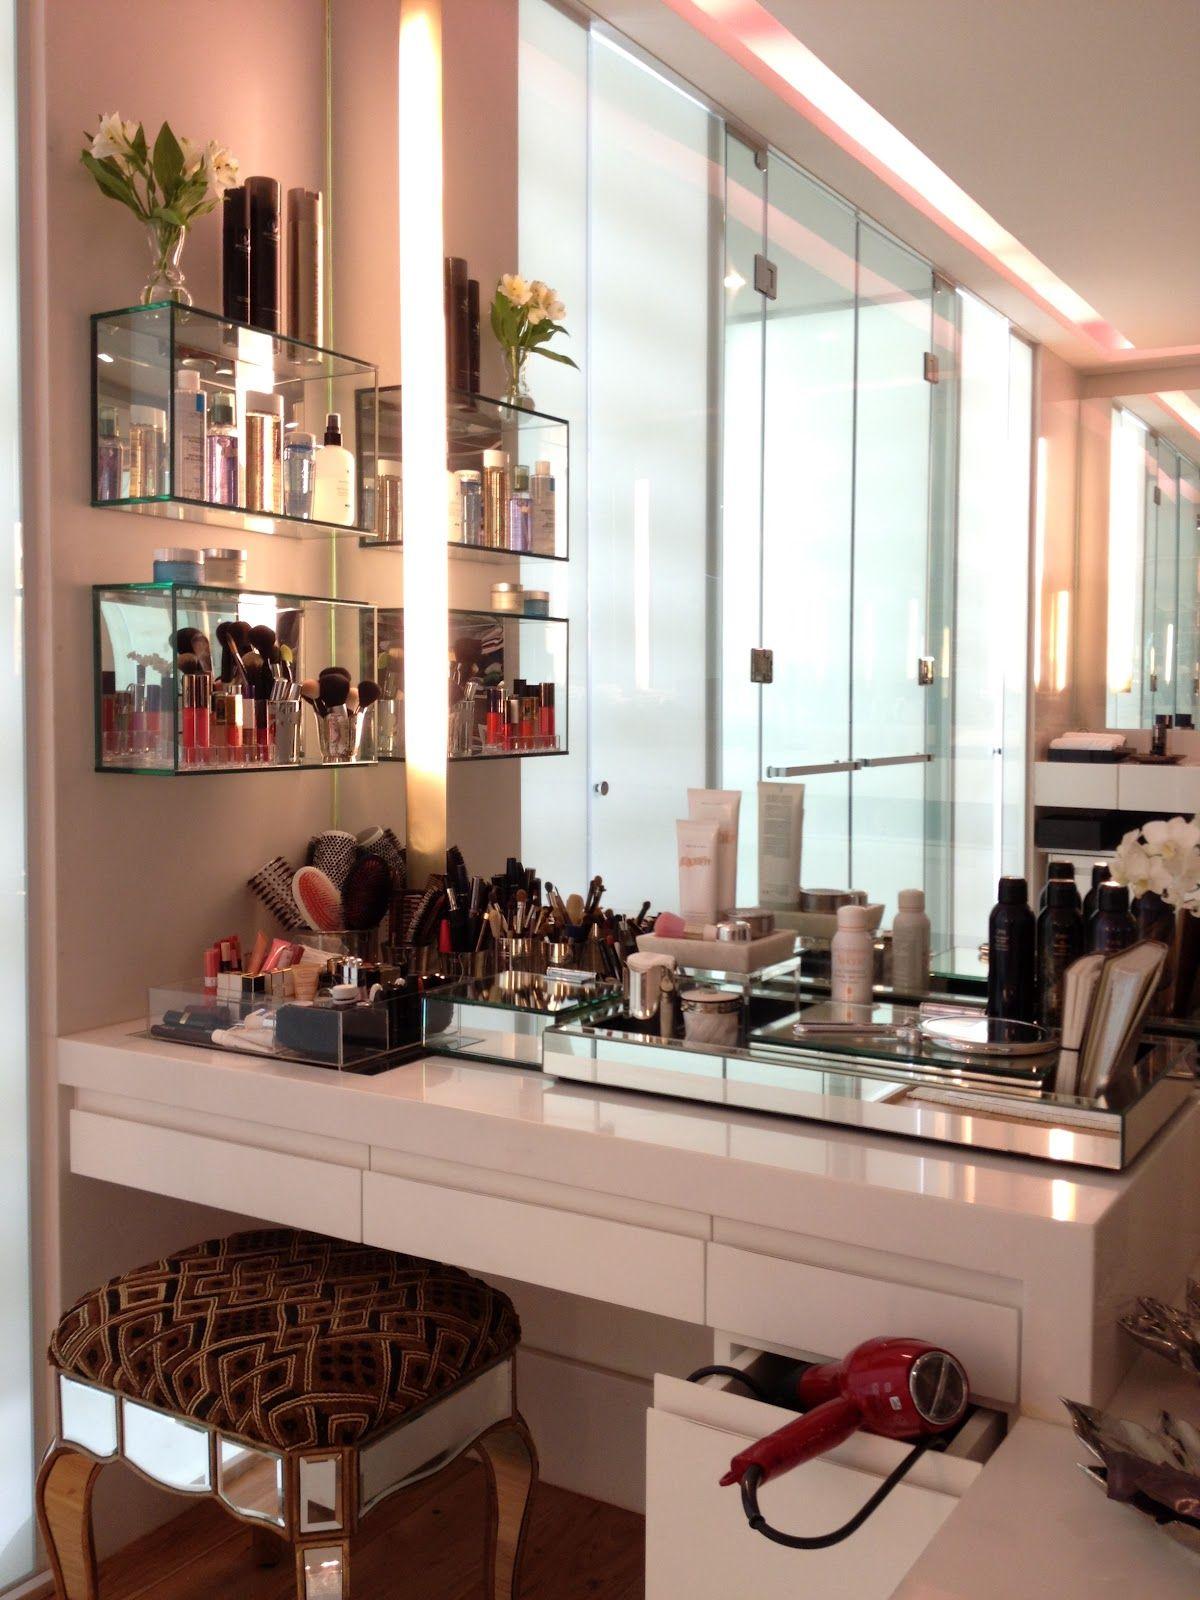 5 Simple Makeup Storage Ideas Everyone Can Do | Makeup storage ...